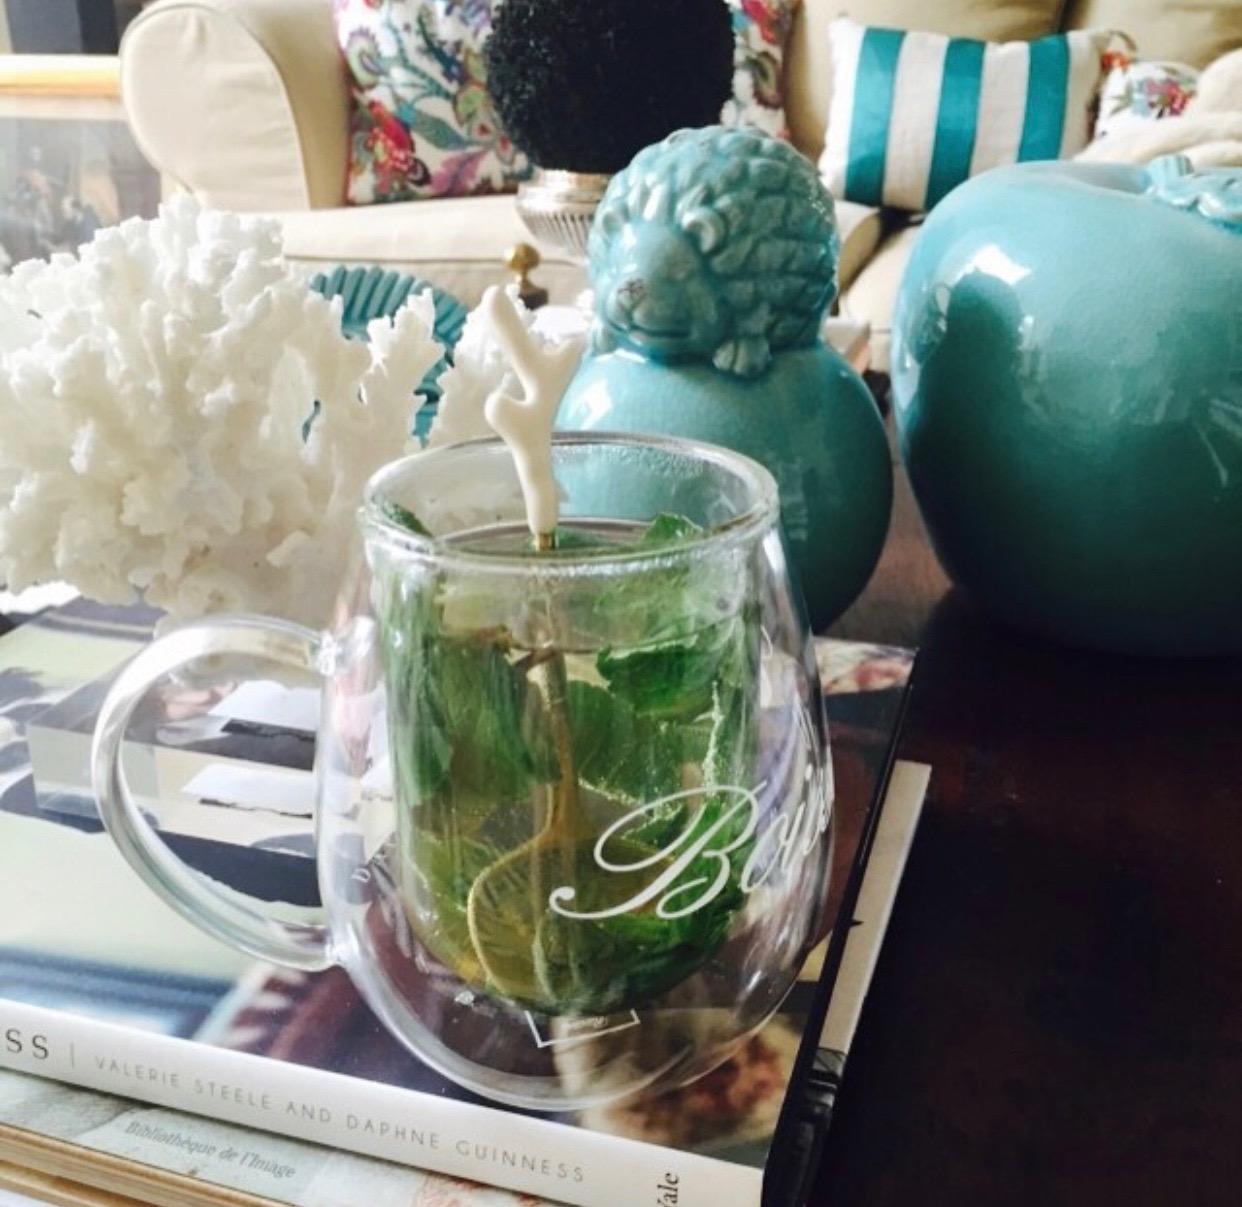 A nice cup of tea mint